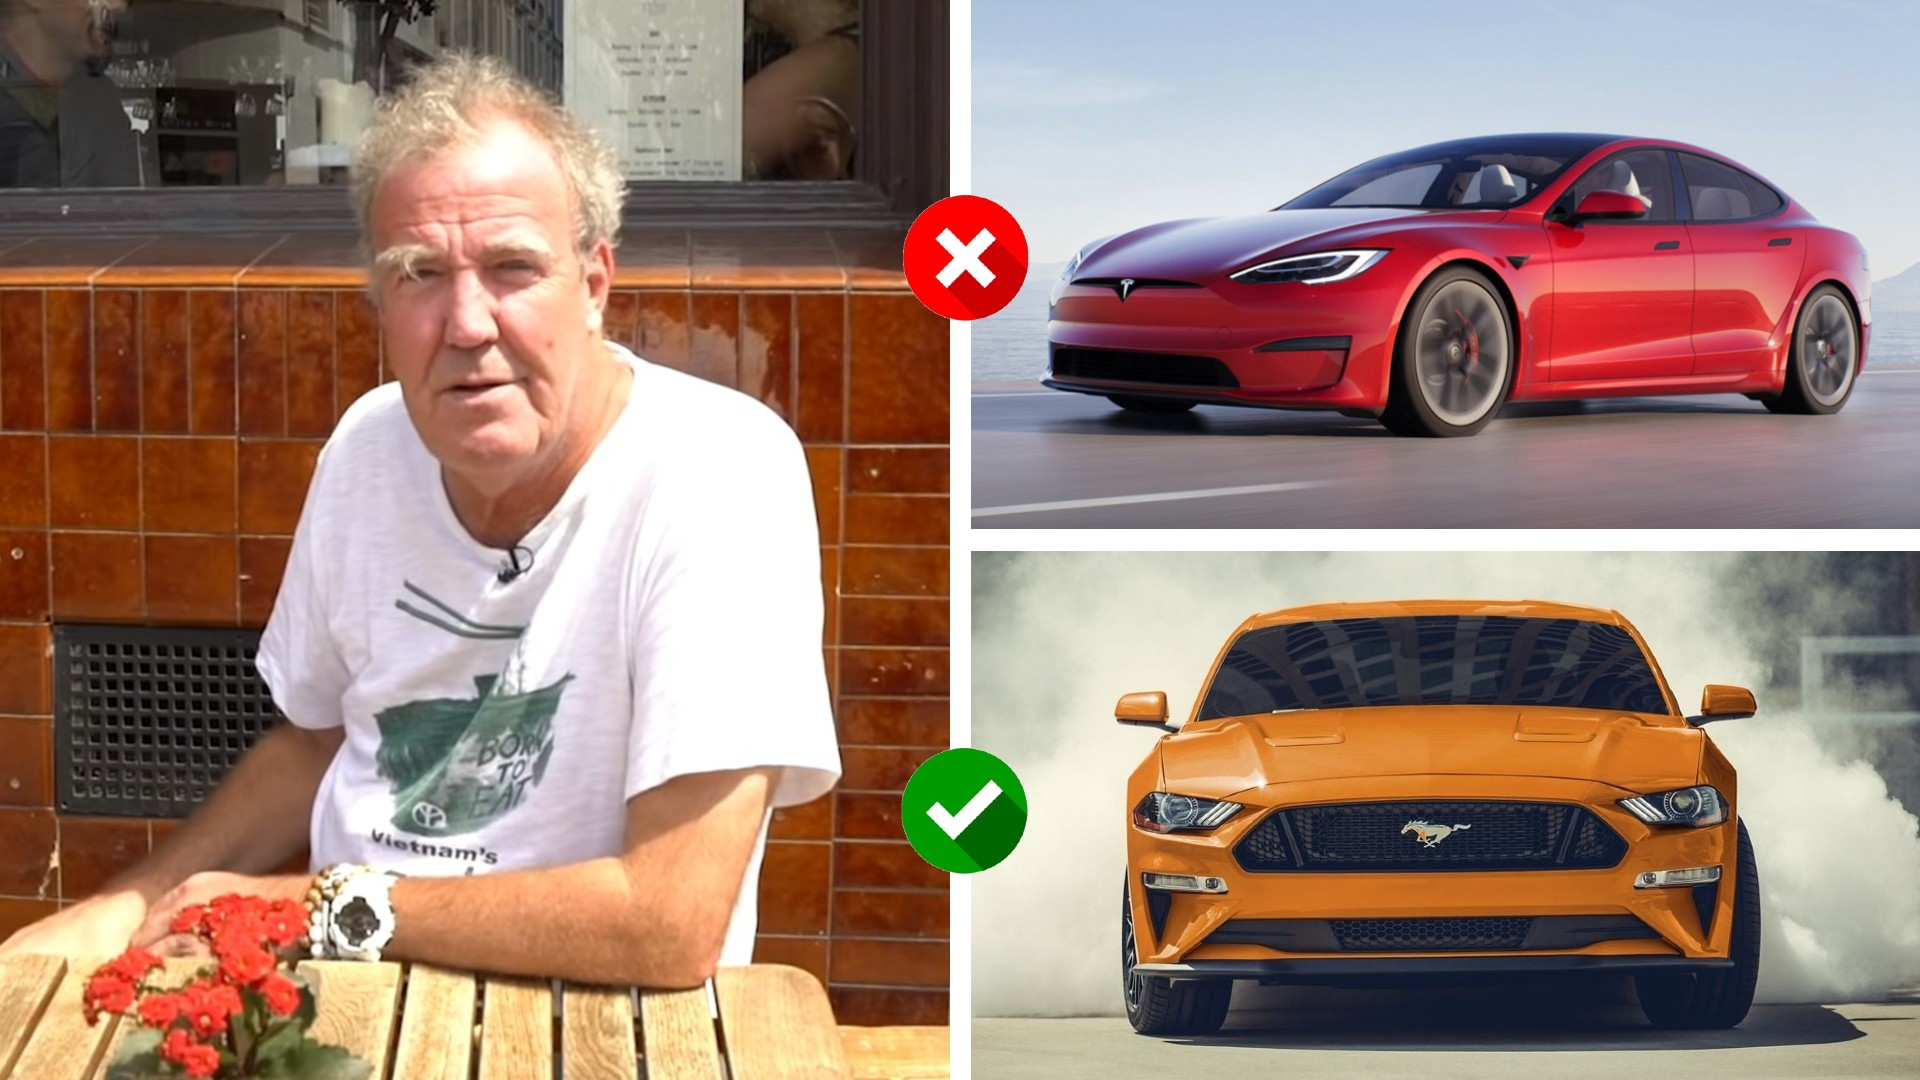 Jeremy Clarkson: O εκκεντρικός παρουσιαστής ρίχνει άκυρο στα ηλεκτρικά αυτοκίνητα! [vid]